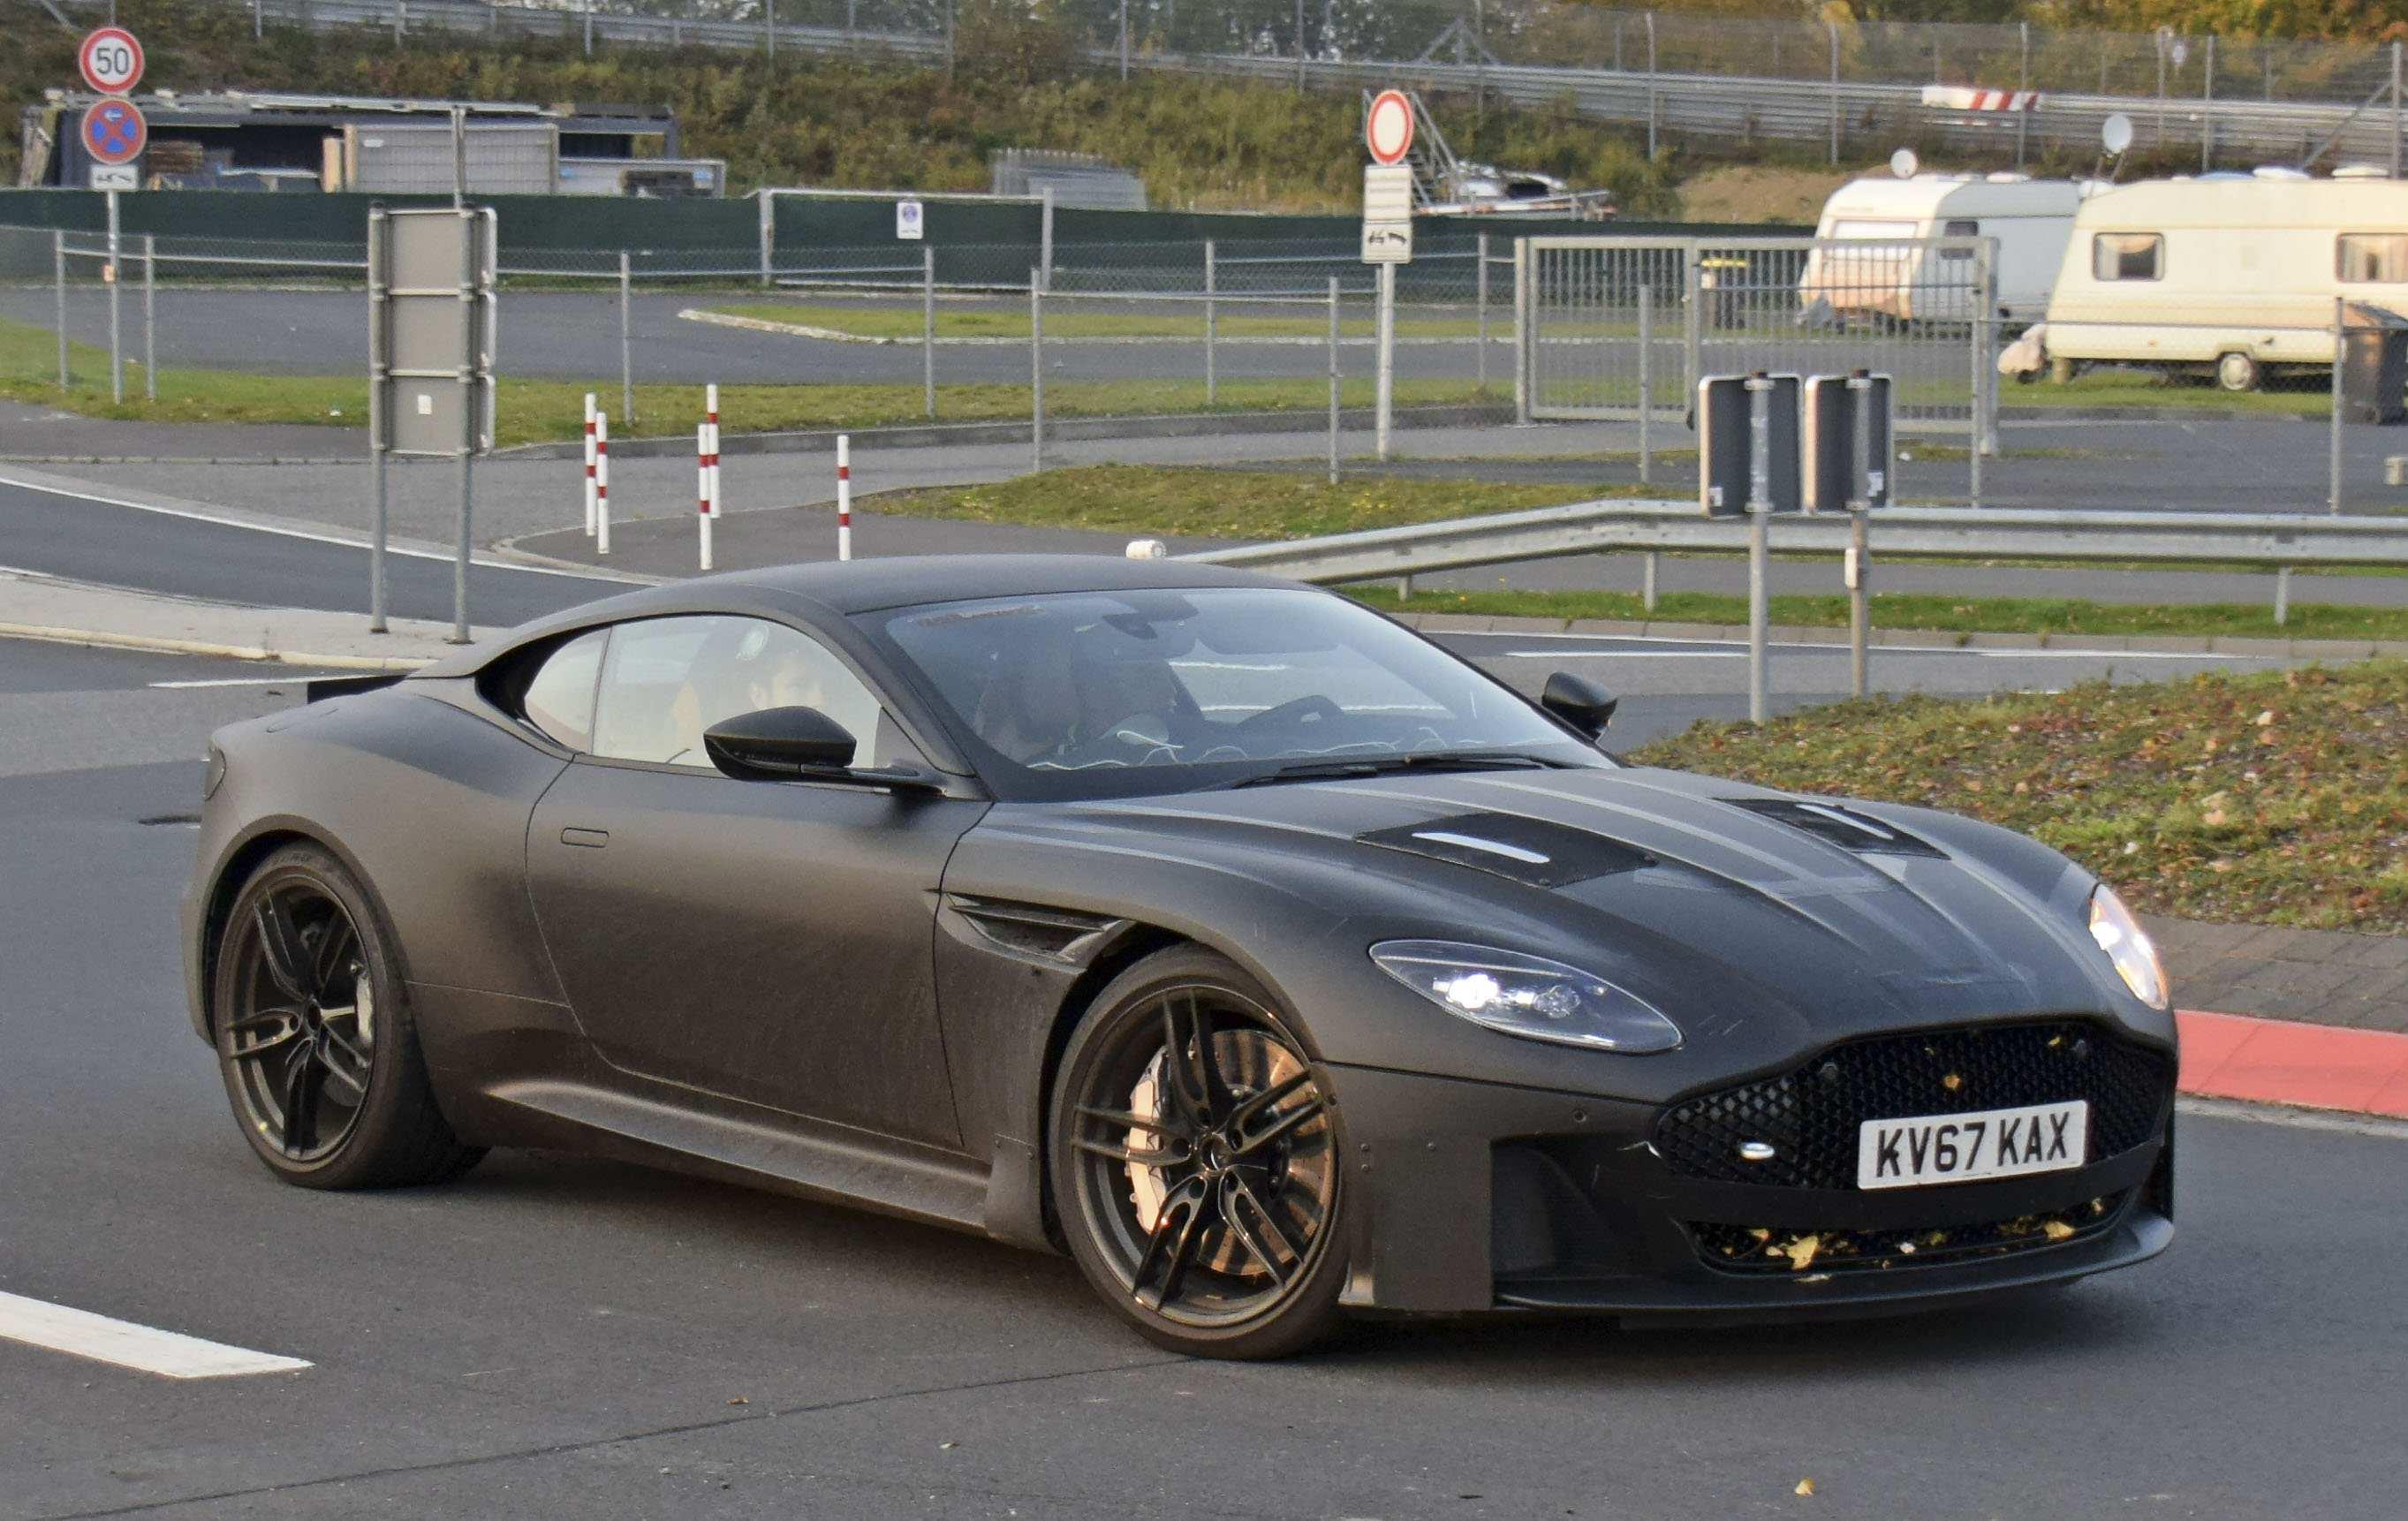 71 Great 2019 Aston Martin Vanquish S Redesign and Concept by 2019 Aston Martin Vanquish S